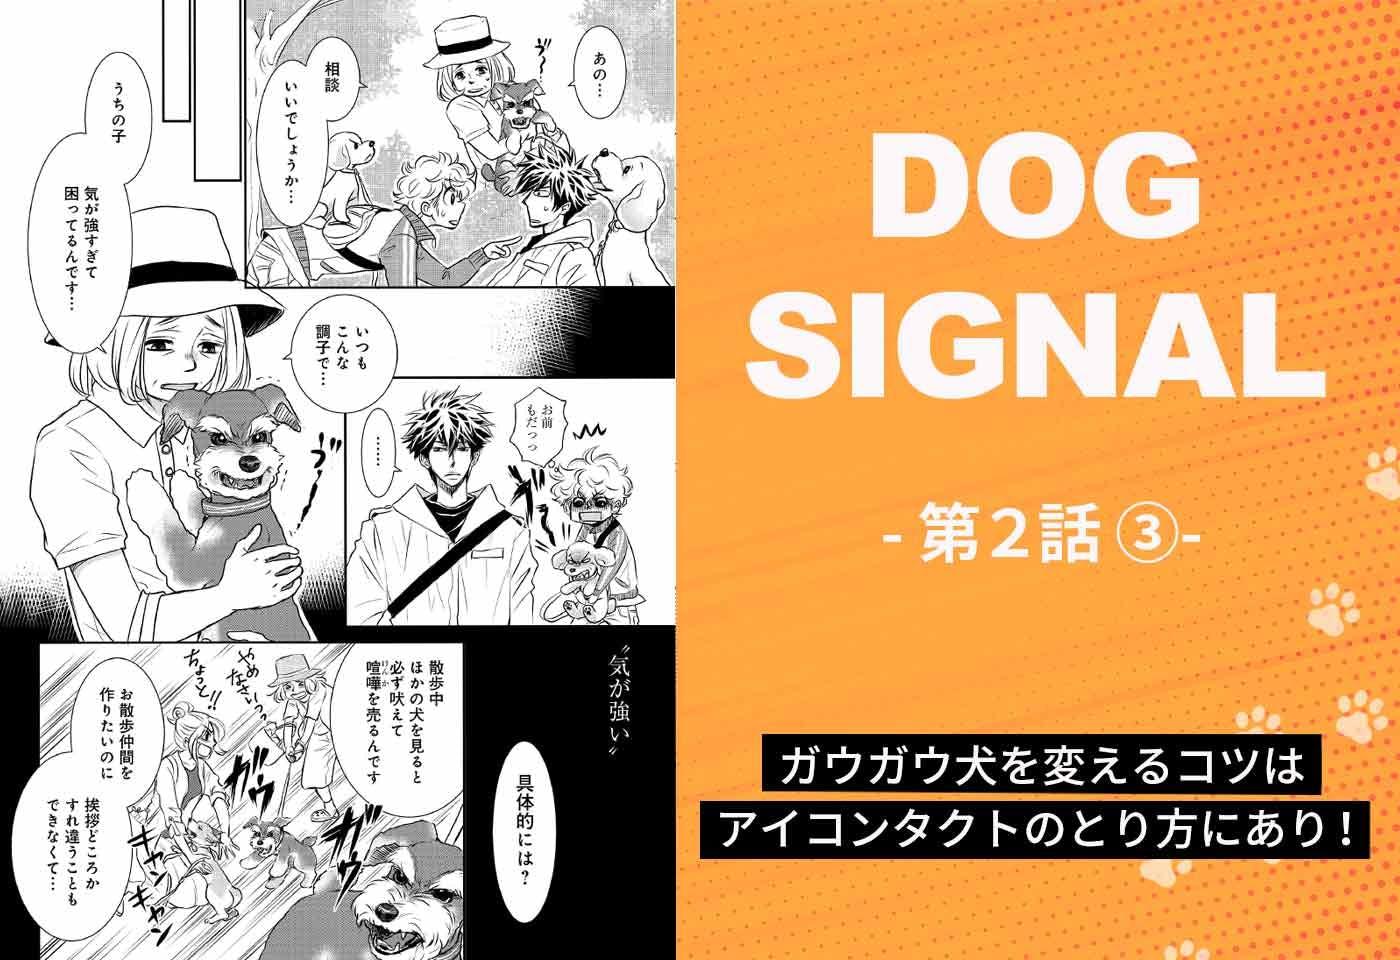 『DOG SIGNAL』2話目 3/4